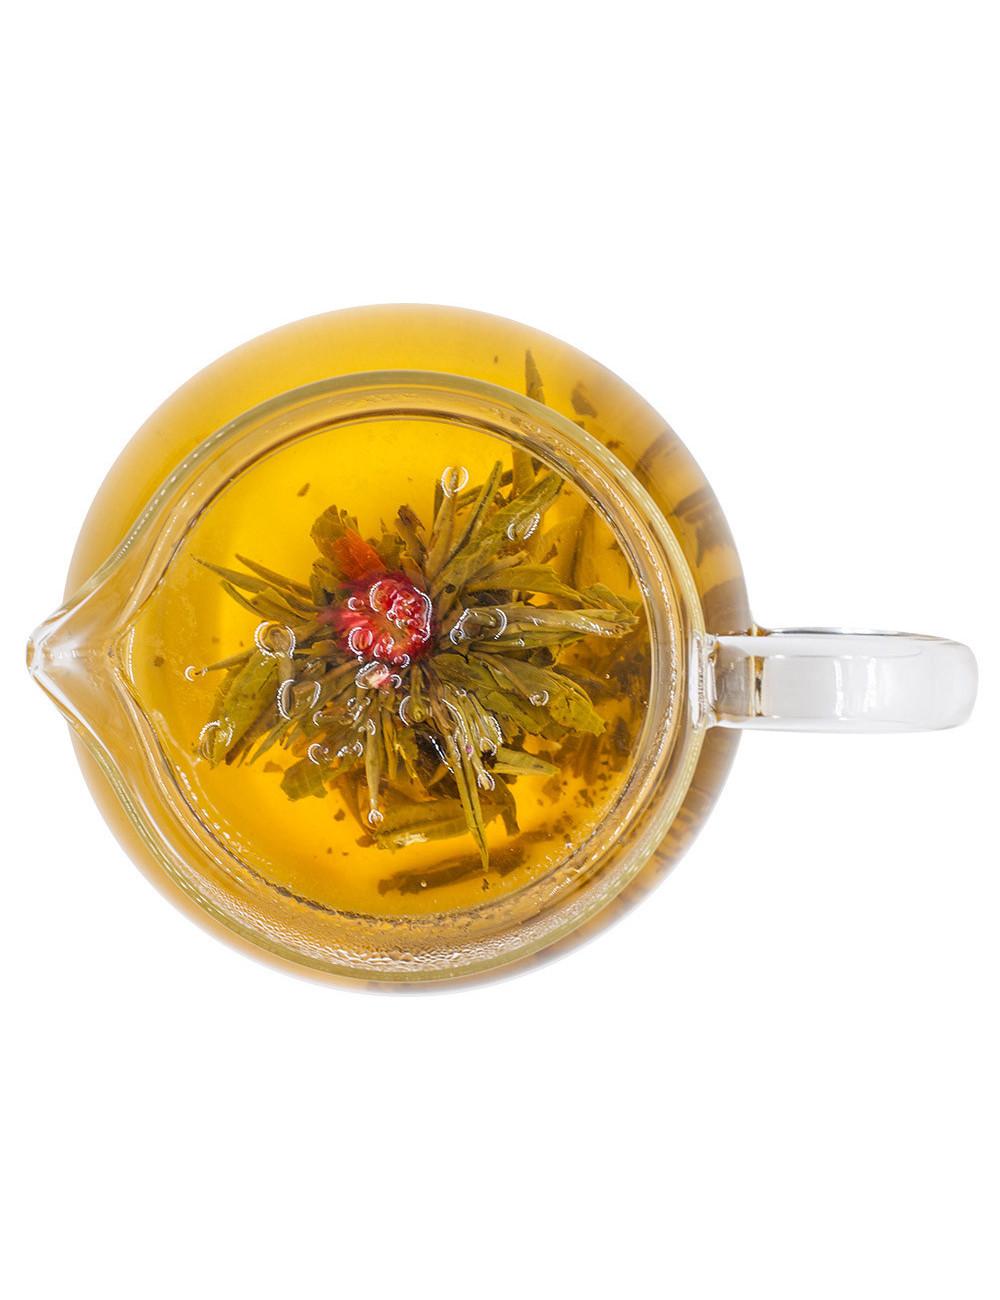 Magia floreale Bouquet di tè bianco - La Pianta del Tè shop online